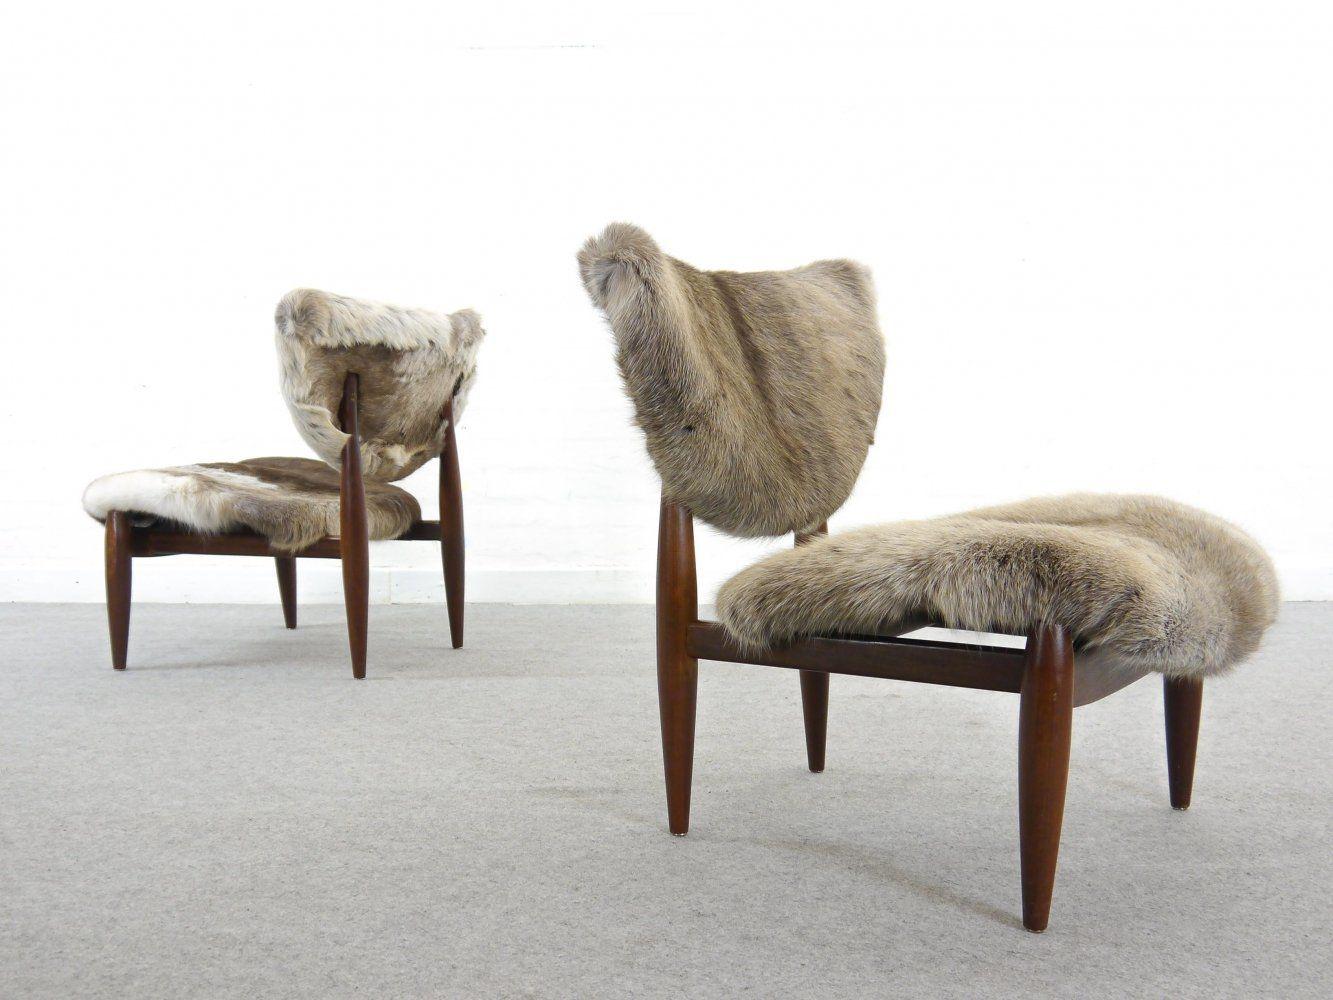 Design Scandinavo Anni 50 pin by maria lindgren on seating | teak lounge chair, chair